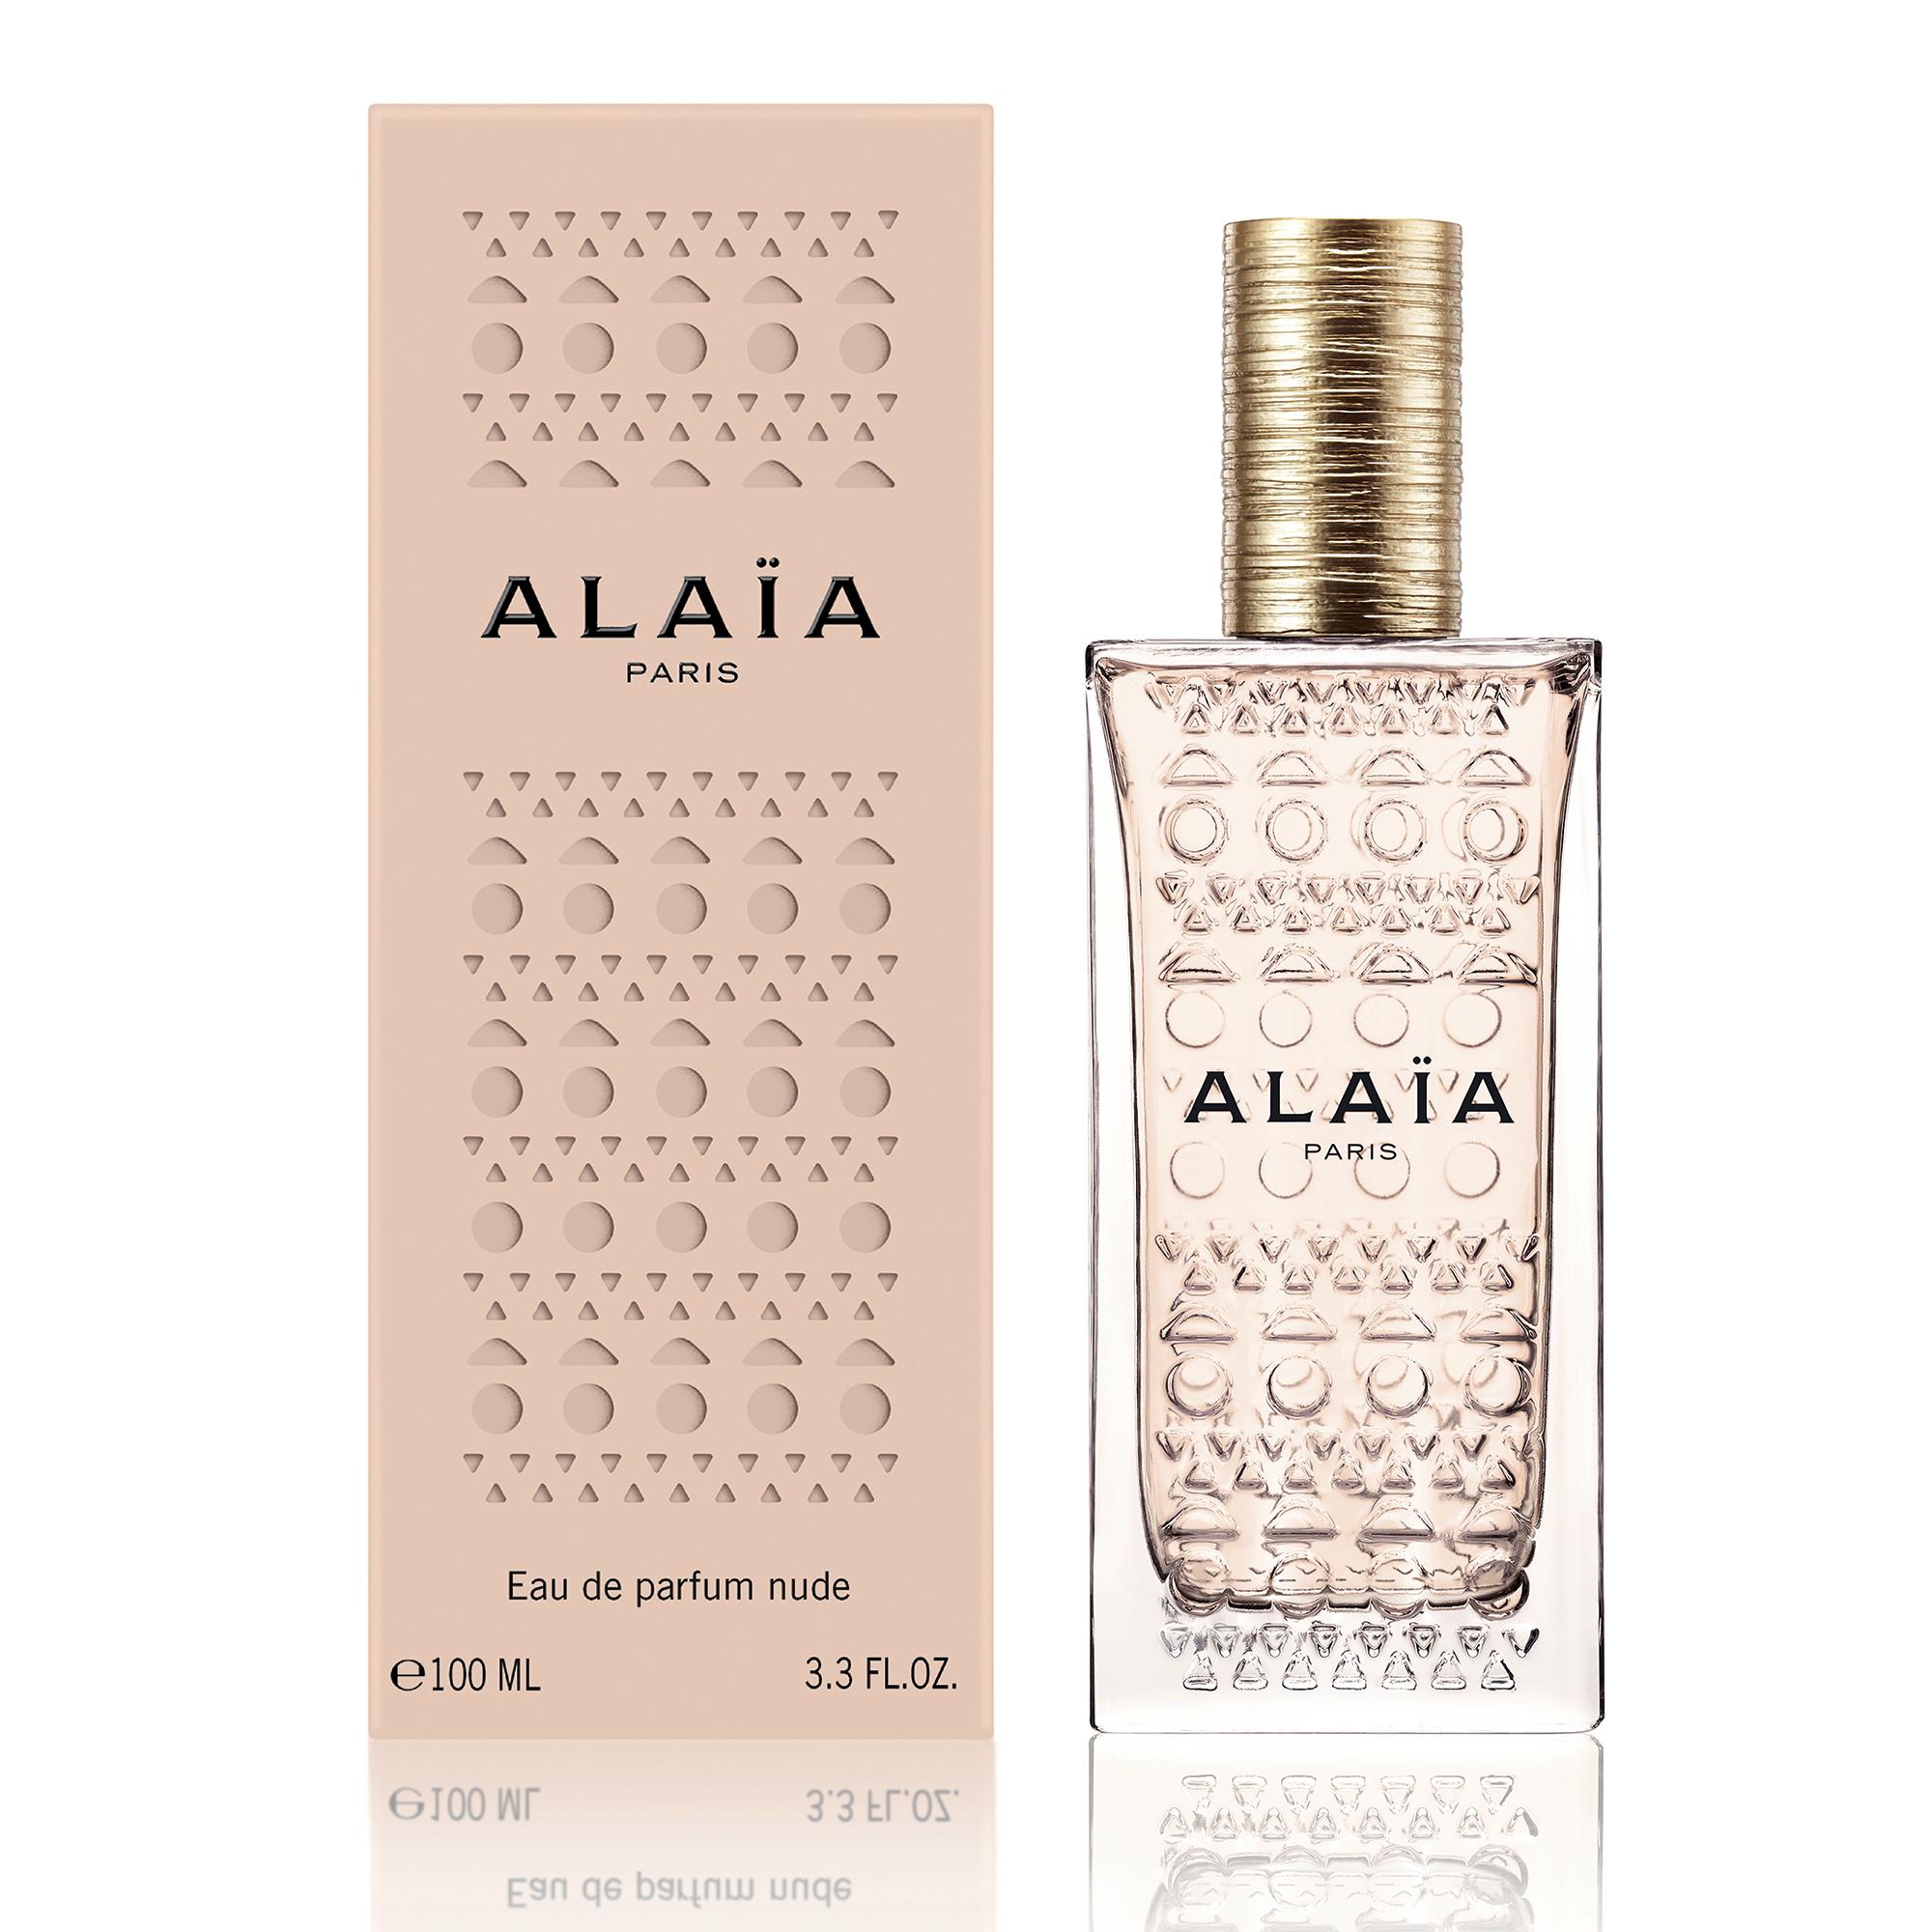 Cum Iti Dai Seama Daca Un Parfum E Original Cosmopolitanro